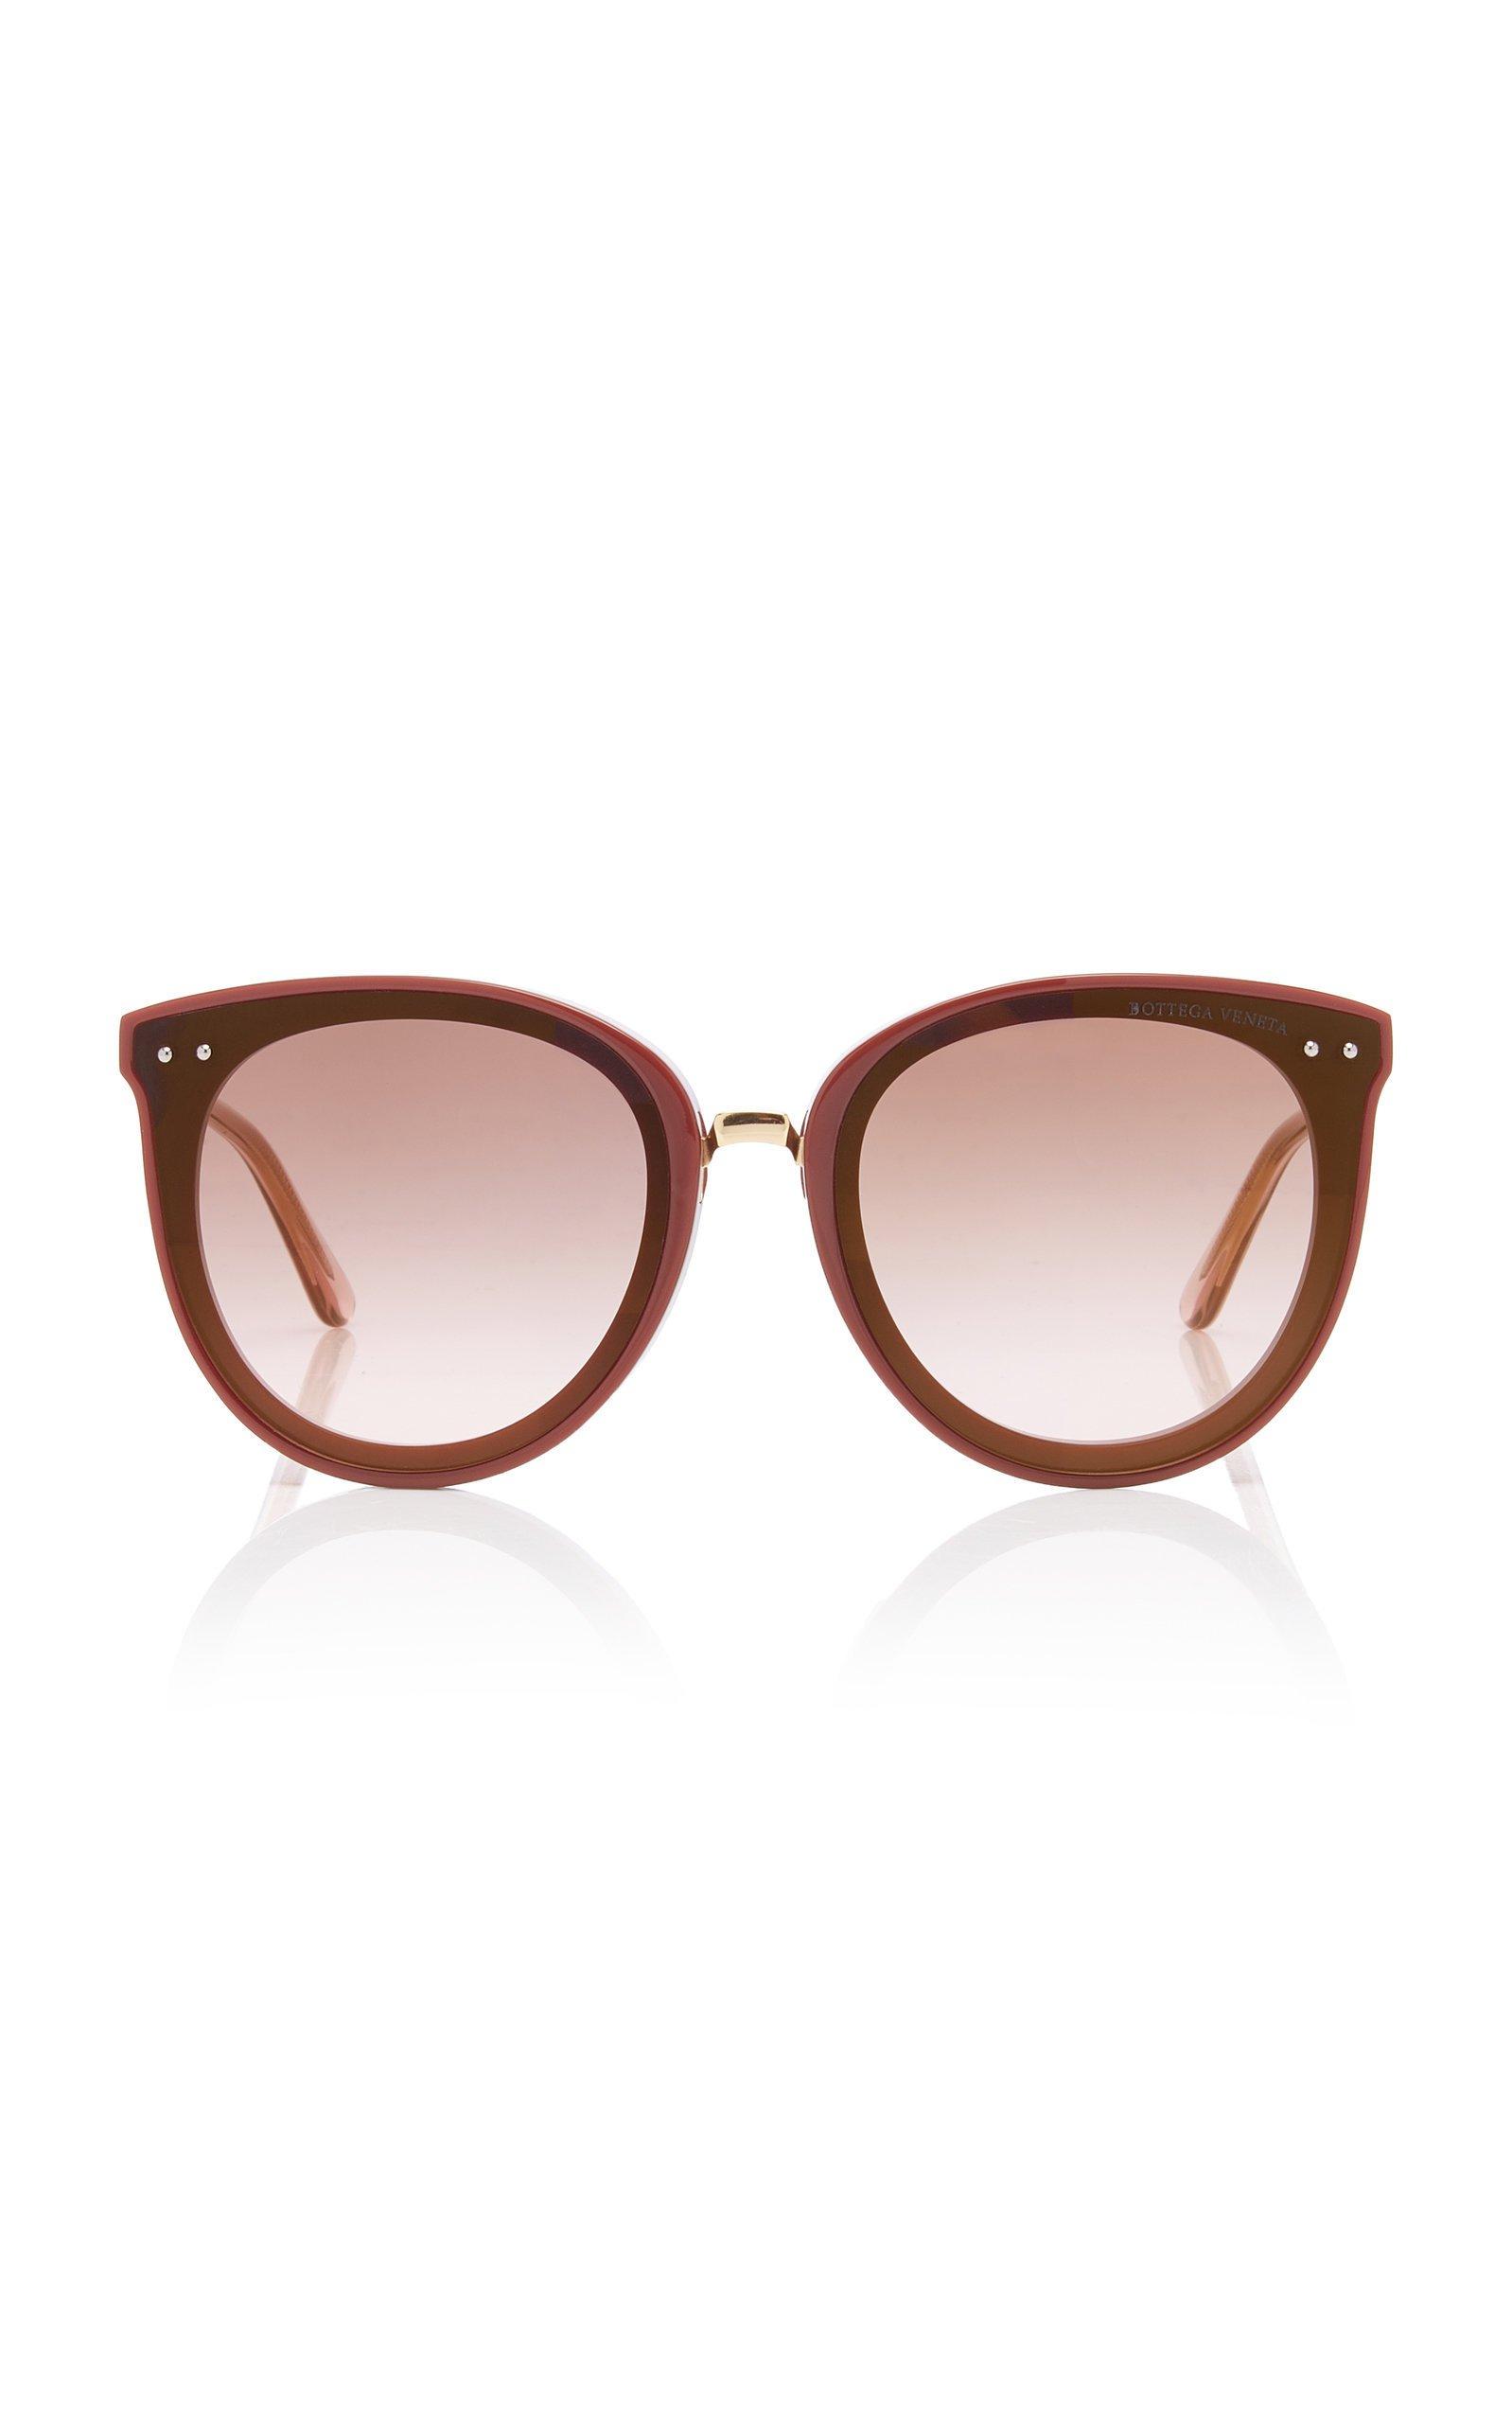 Bottega Veneta Sunglasses Acetate Cat-Eye Sunglasses